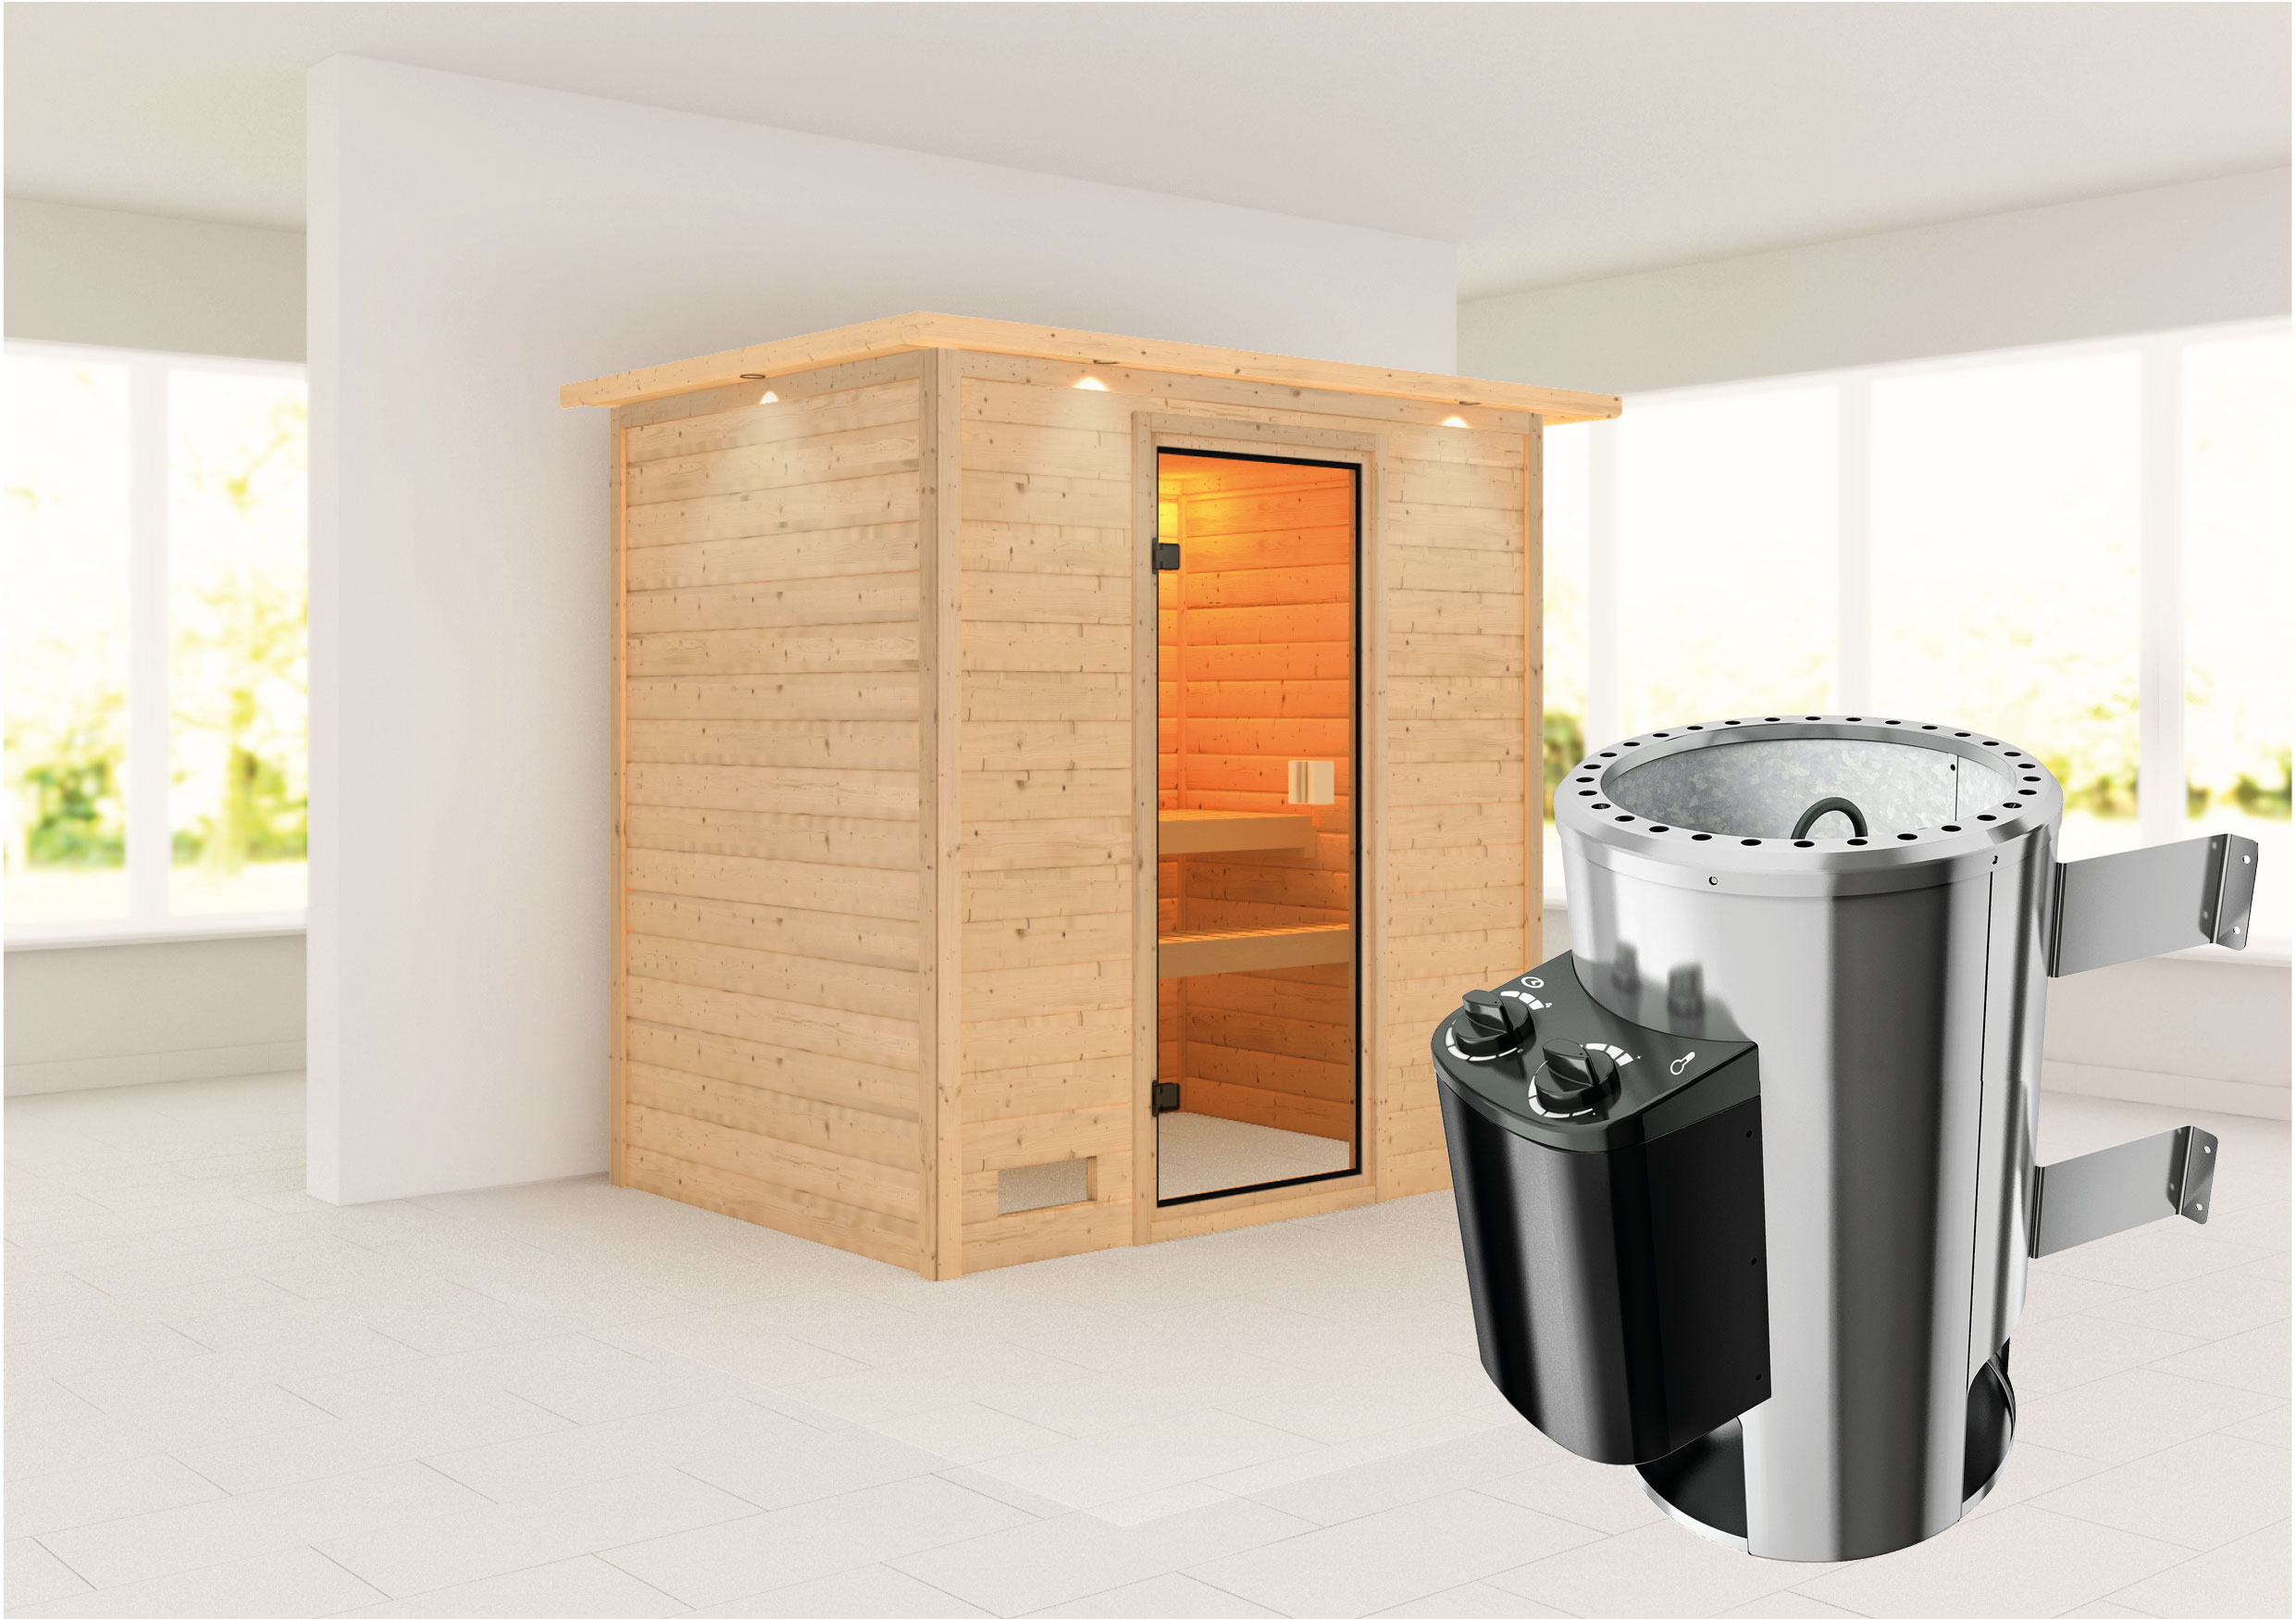 Karibu Sauna Ronja 38mm 230V Dachkranz + Ofen 3,6kW intern classic Tür Bild 1